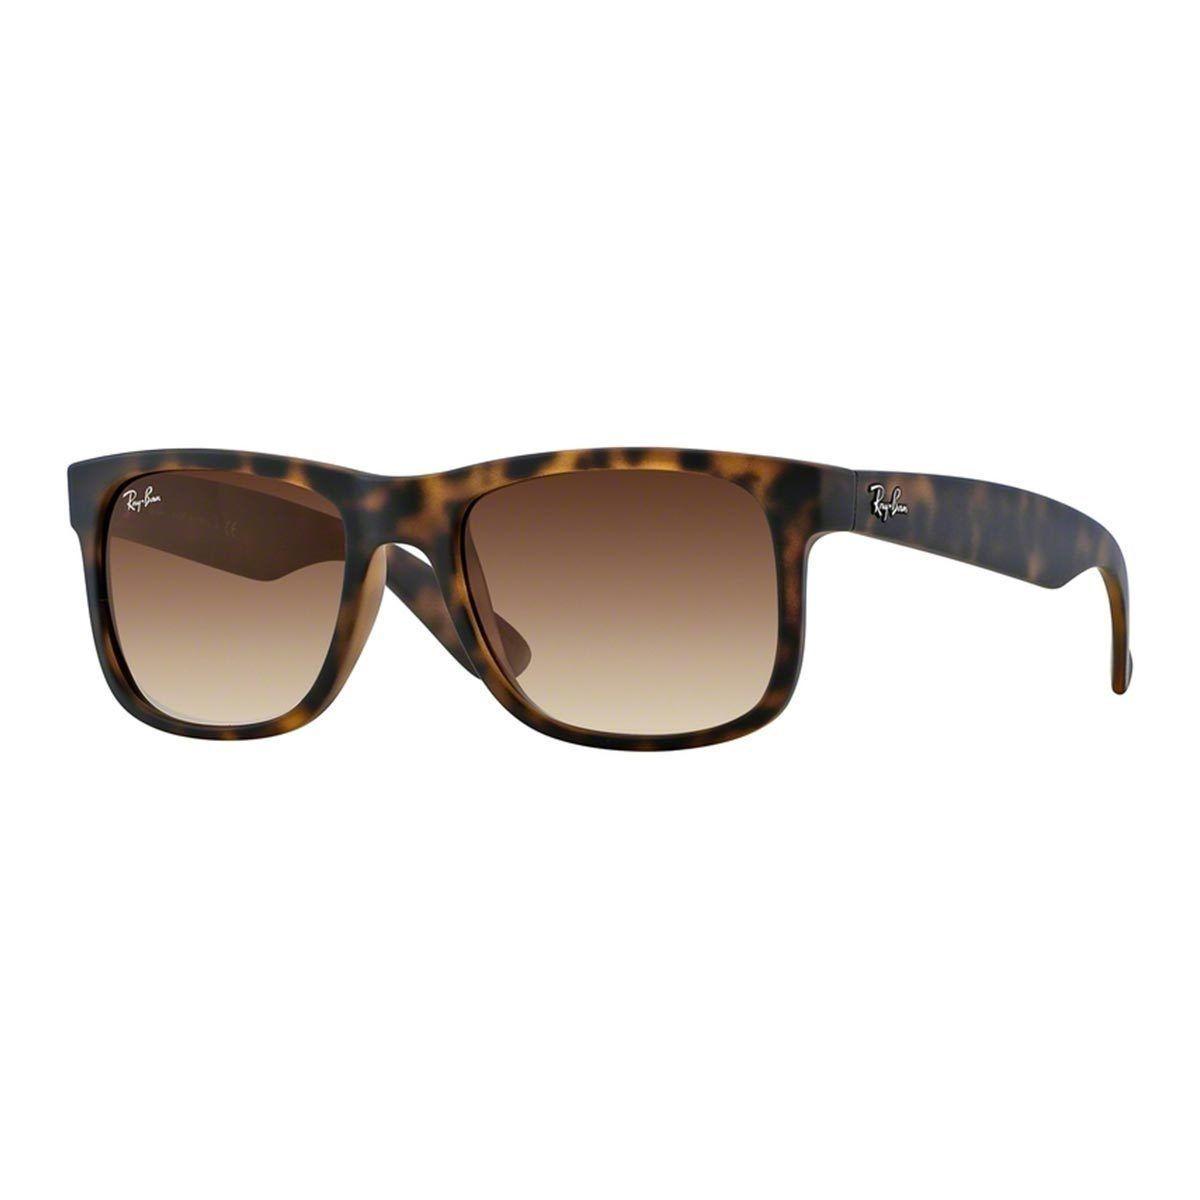 582fd6ff24 Ray-Ban Justin Wayfarer RB4165 Unisex Tortoise (Green) Frame Brown Gradient  Lens Sunglasses (51 mm)